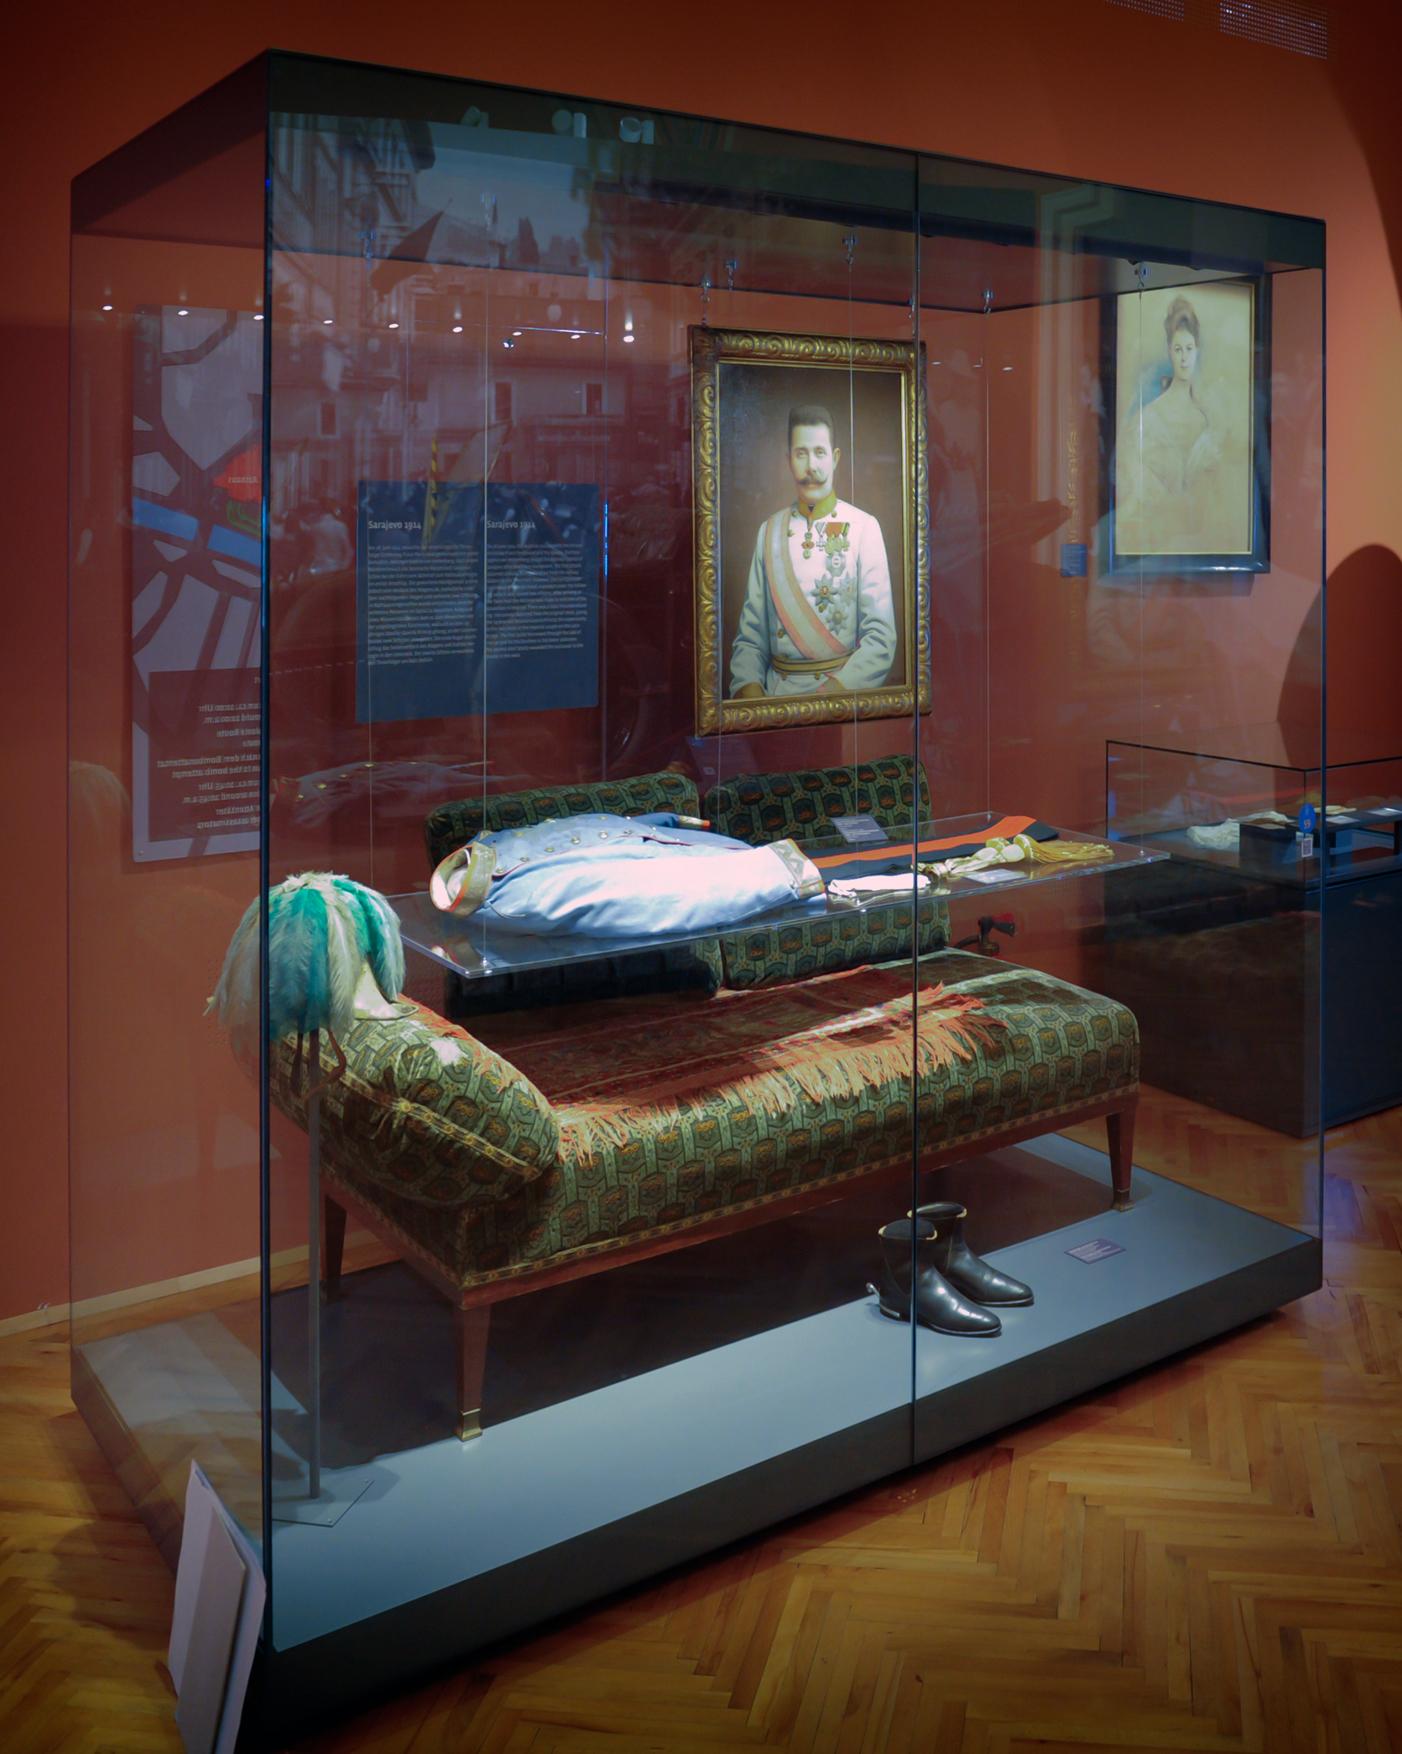 chaiselongue wikipedia File:HGM Chaiselongue Franz Ferdinand.jpg